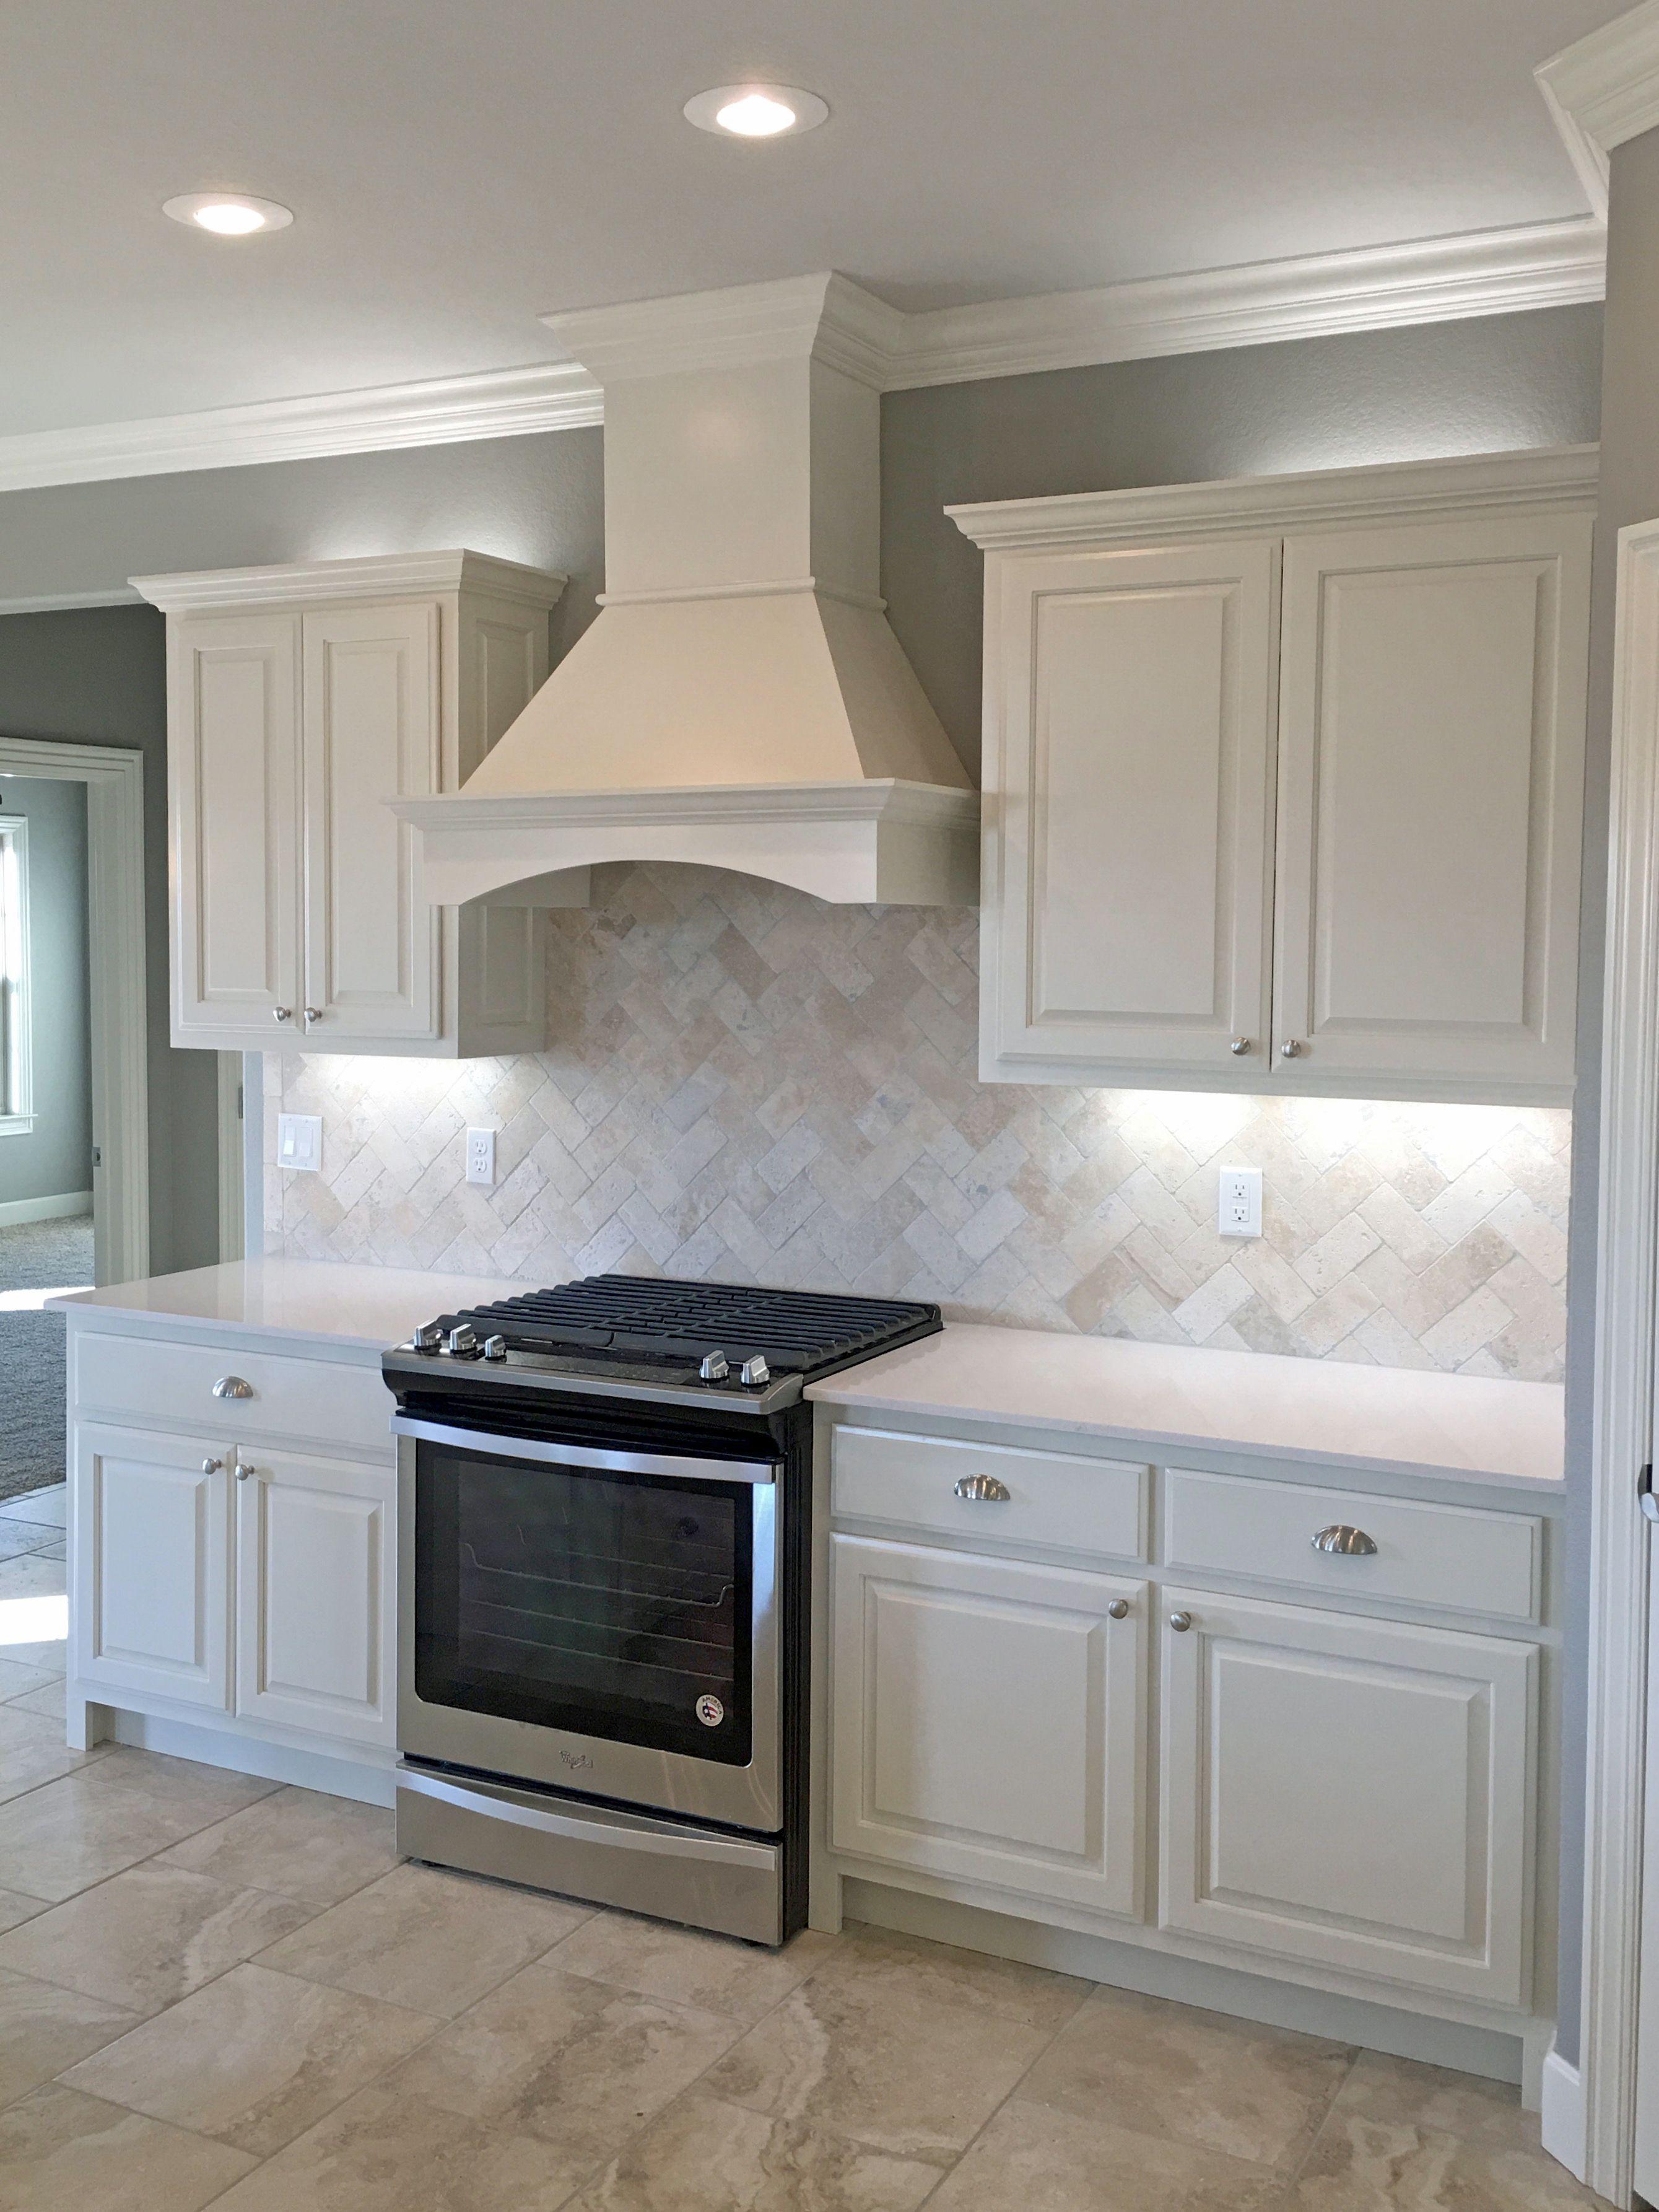 Glass tile designs for kitchen backsplash kitchen storage ideas